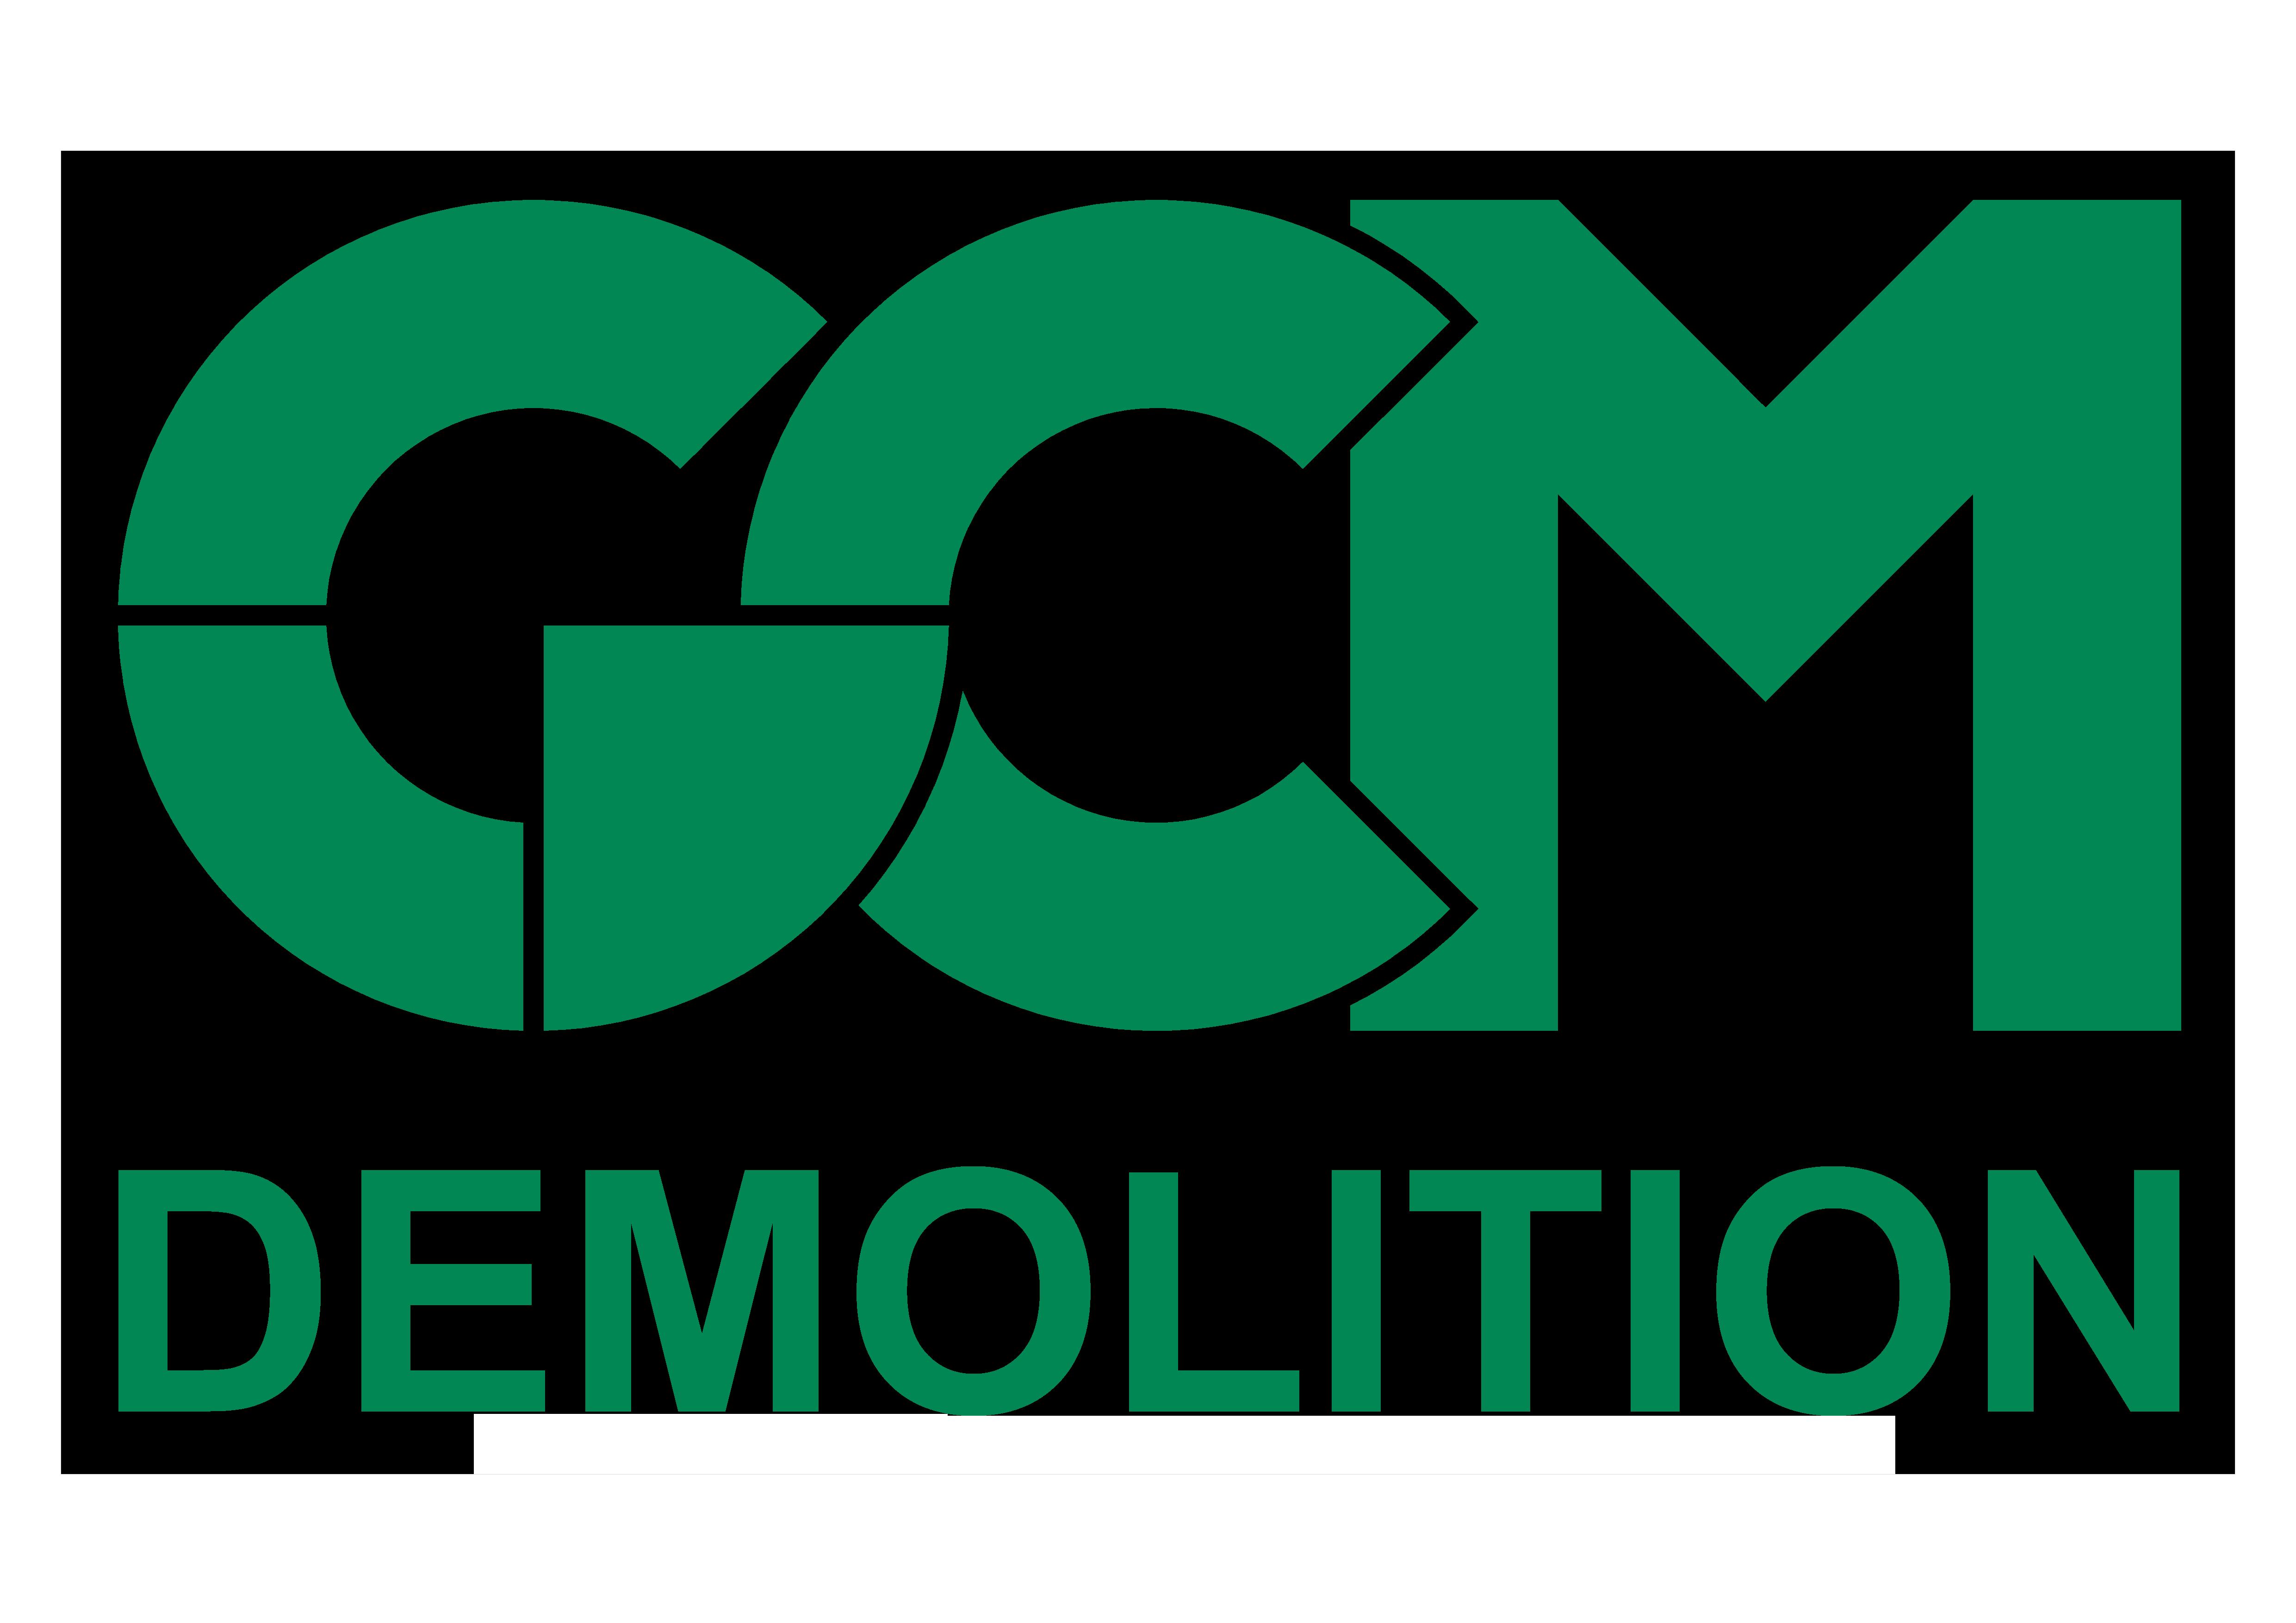 NOS SPONSORS logo gcm demolition